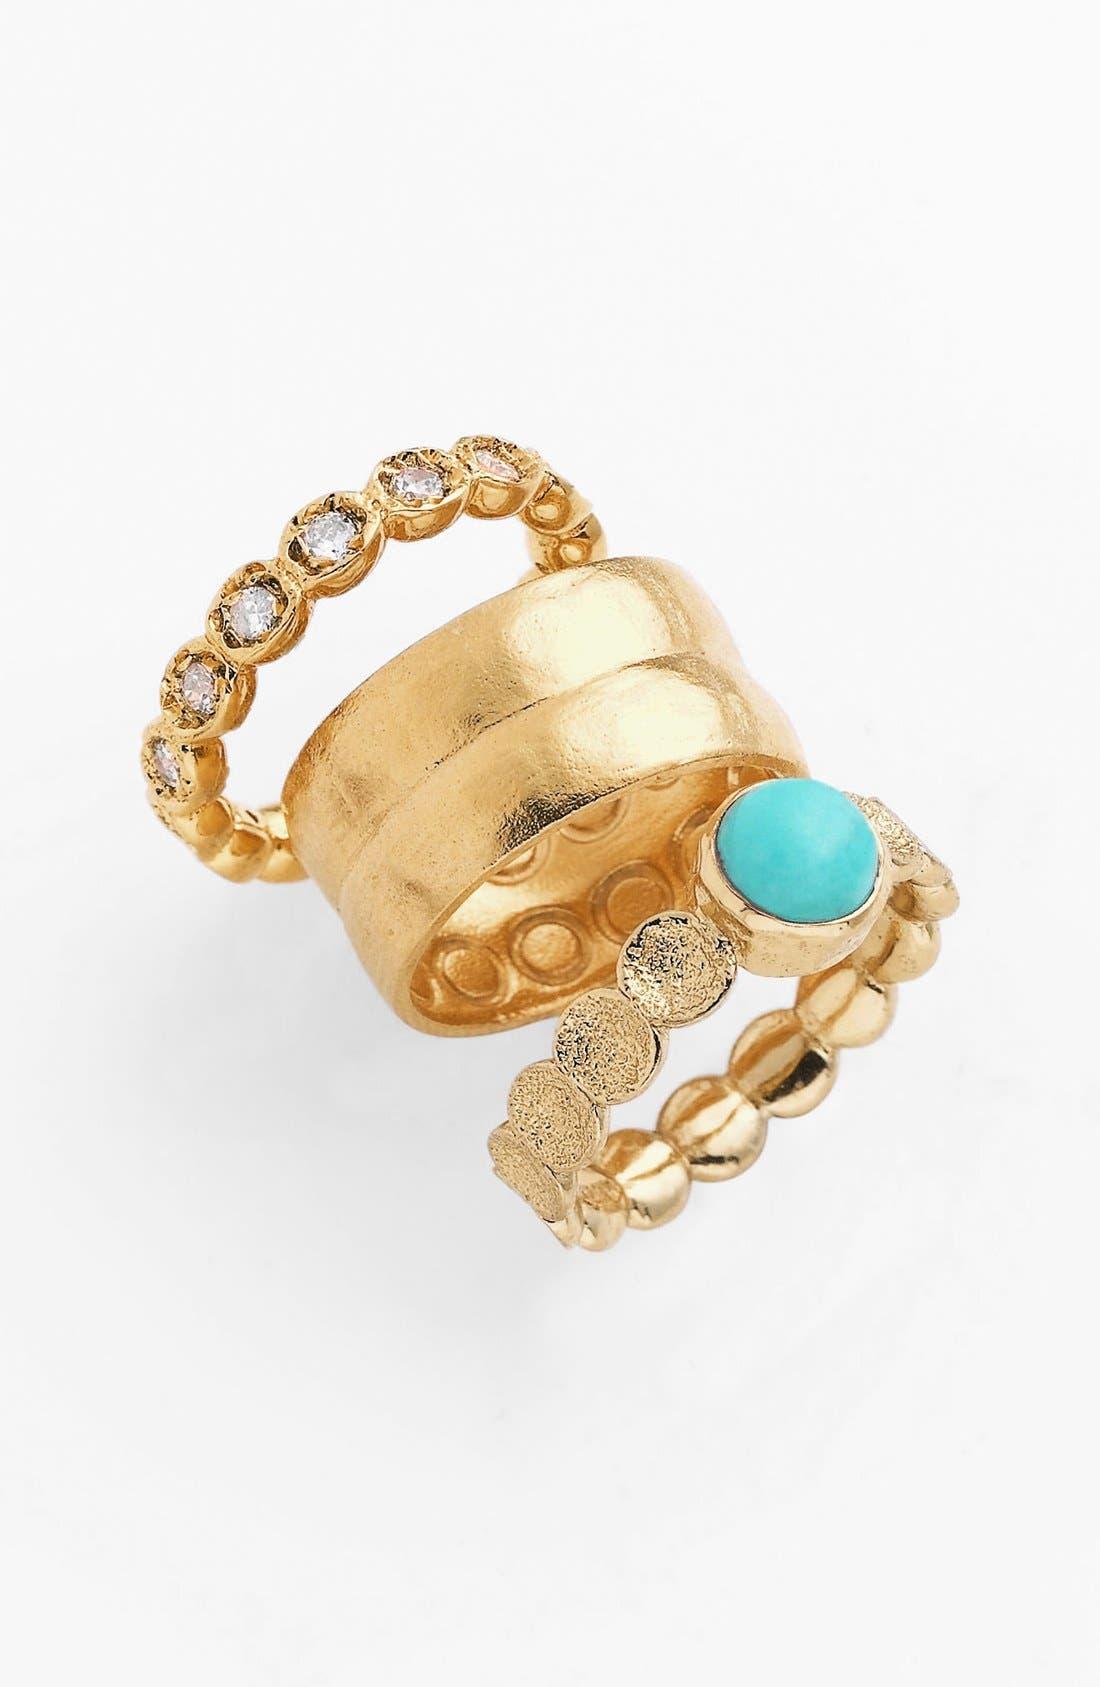 Alternate Image 1 Selected - Melinda Maria 'Capulet' Stackable Rings (Set of 3) (Nordstrom Exclusive)